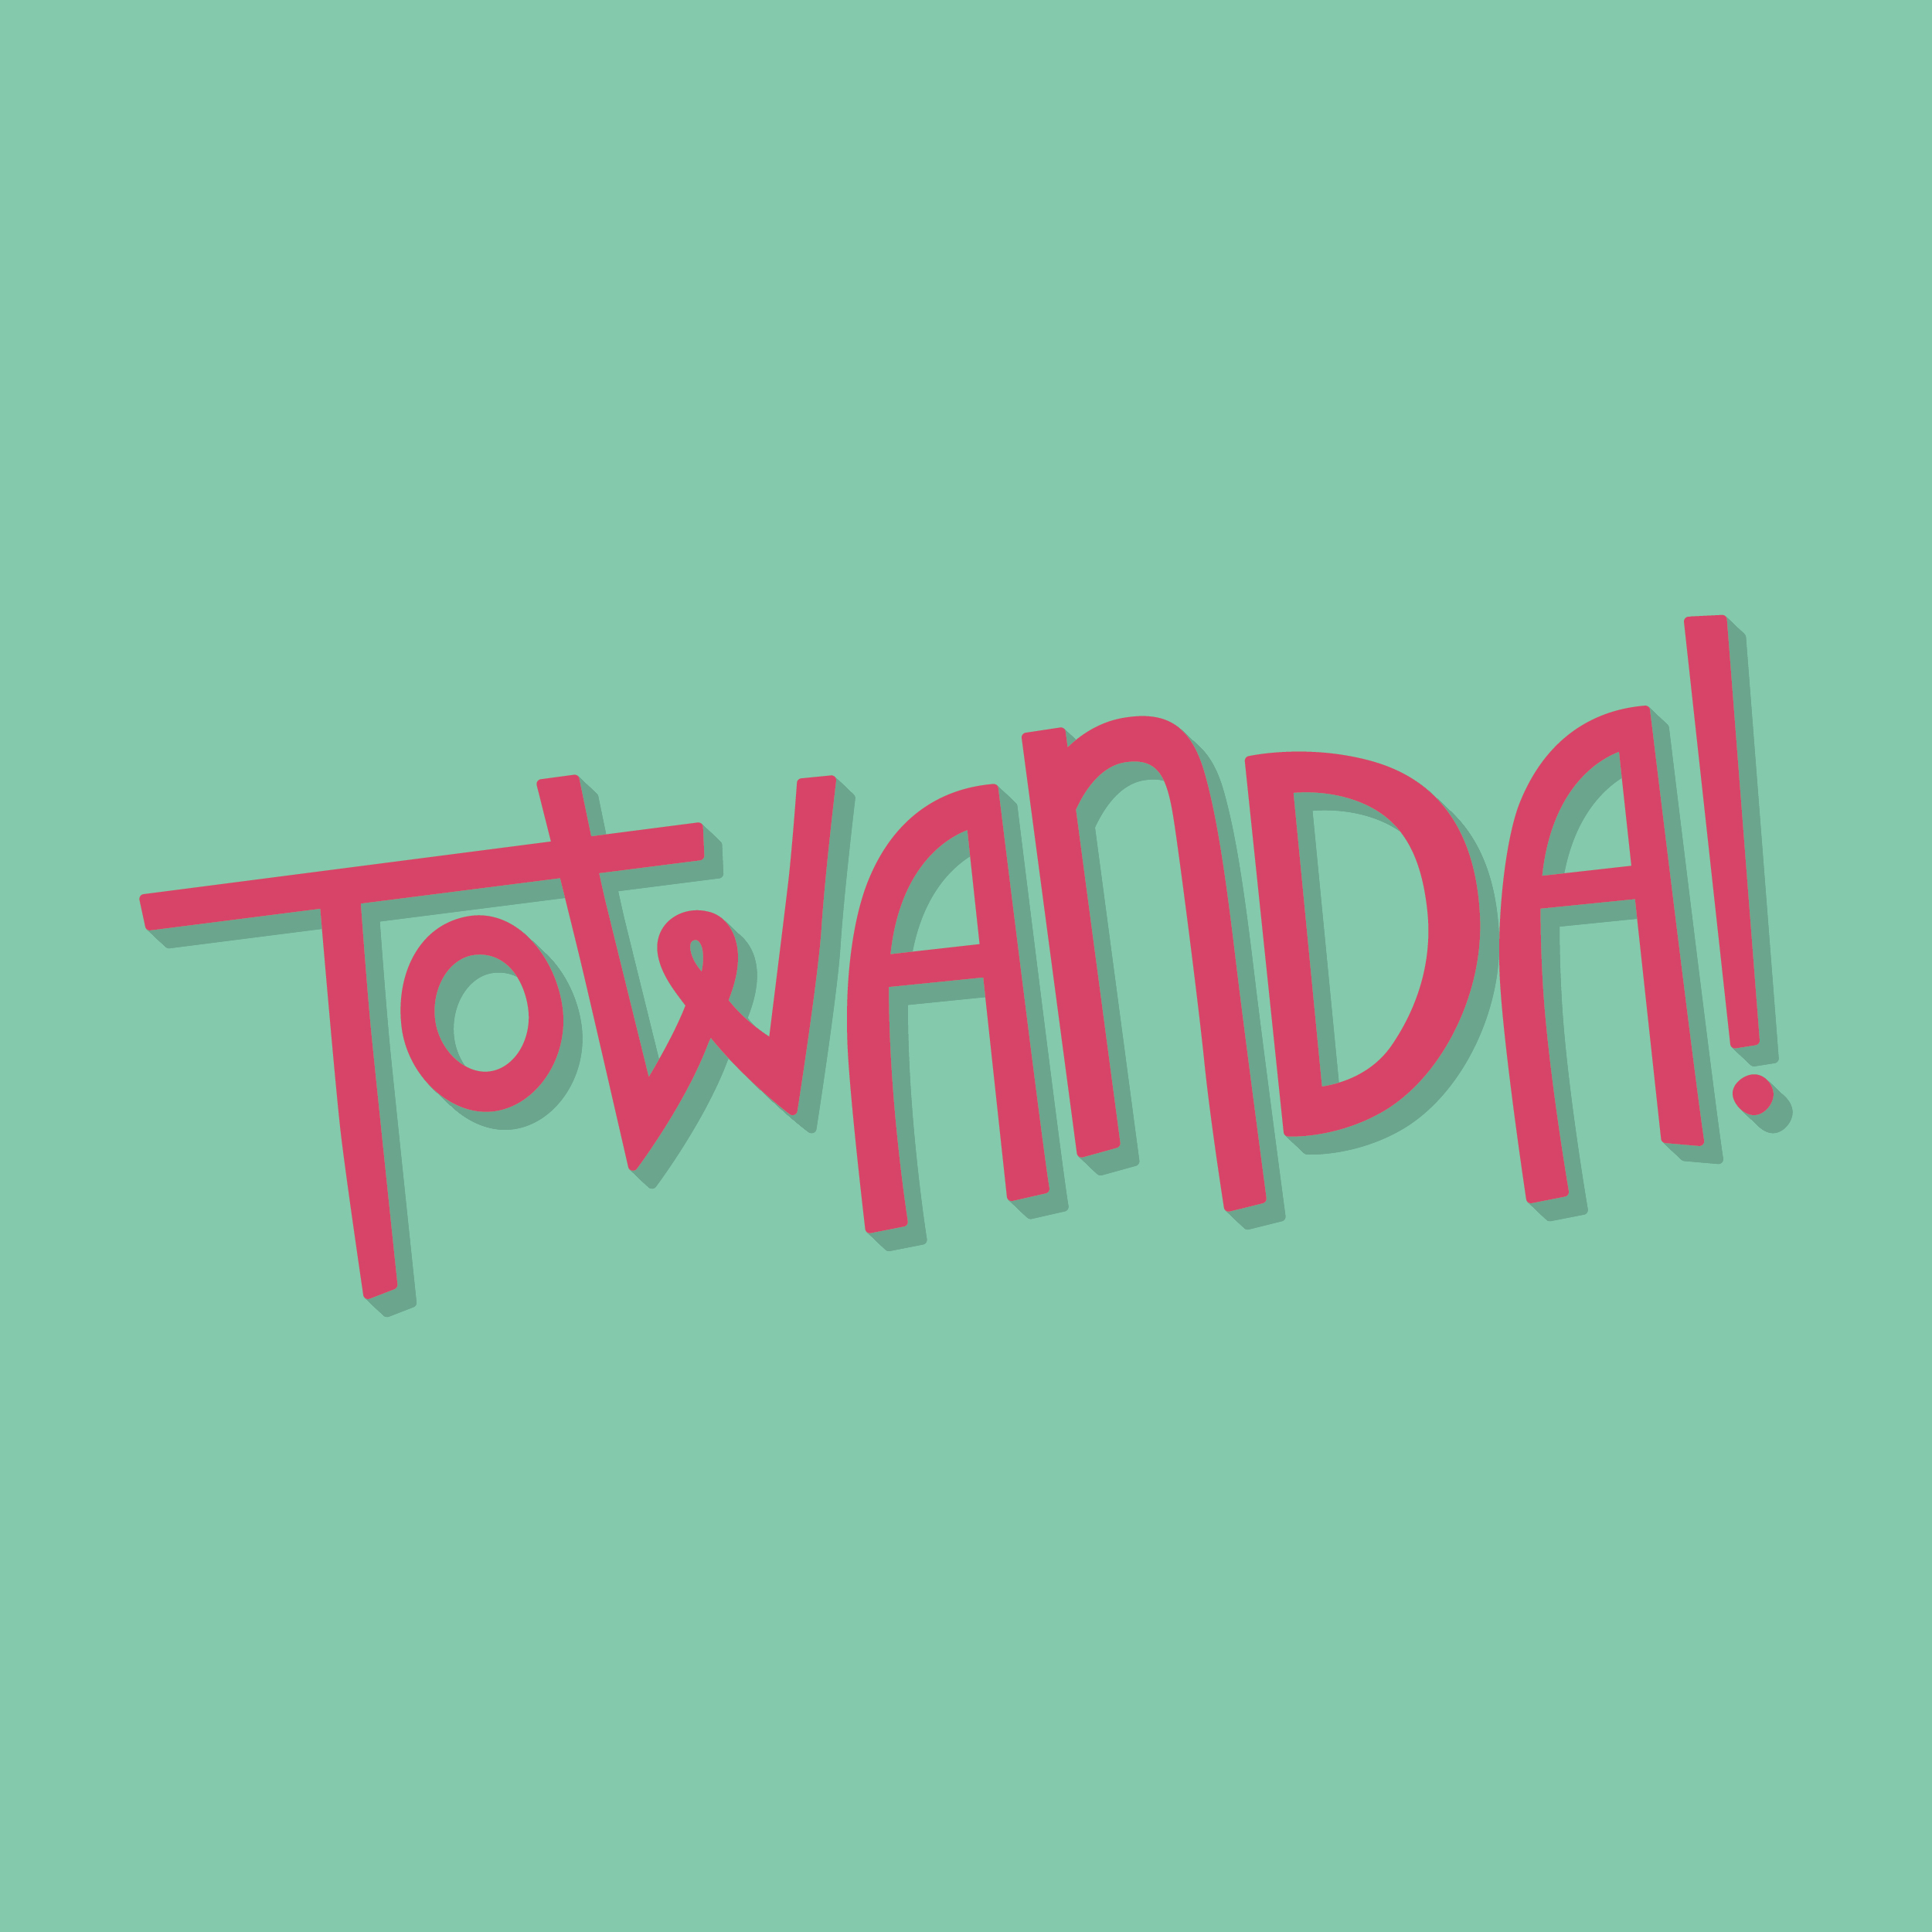 Towanda-01.jpg